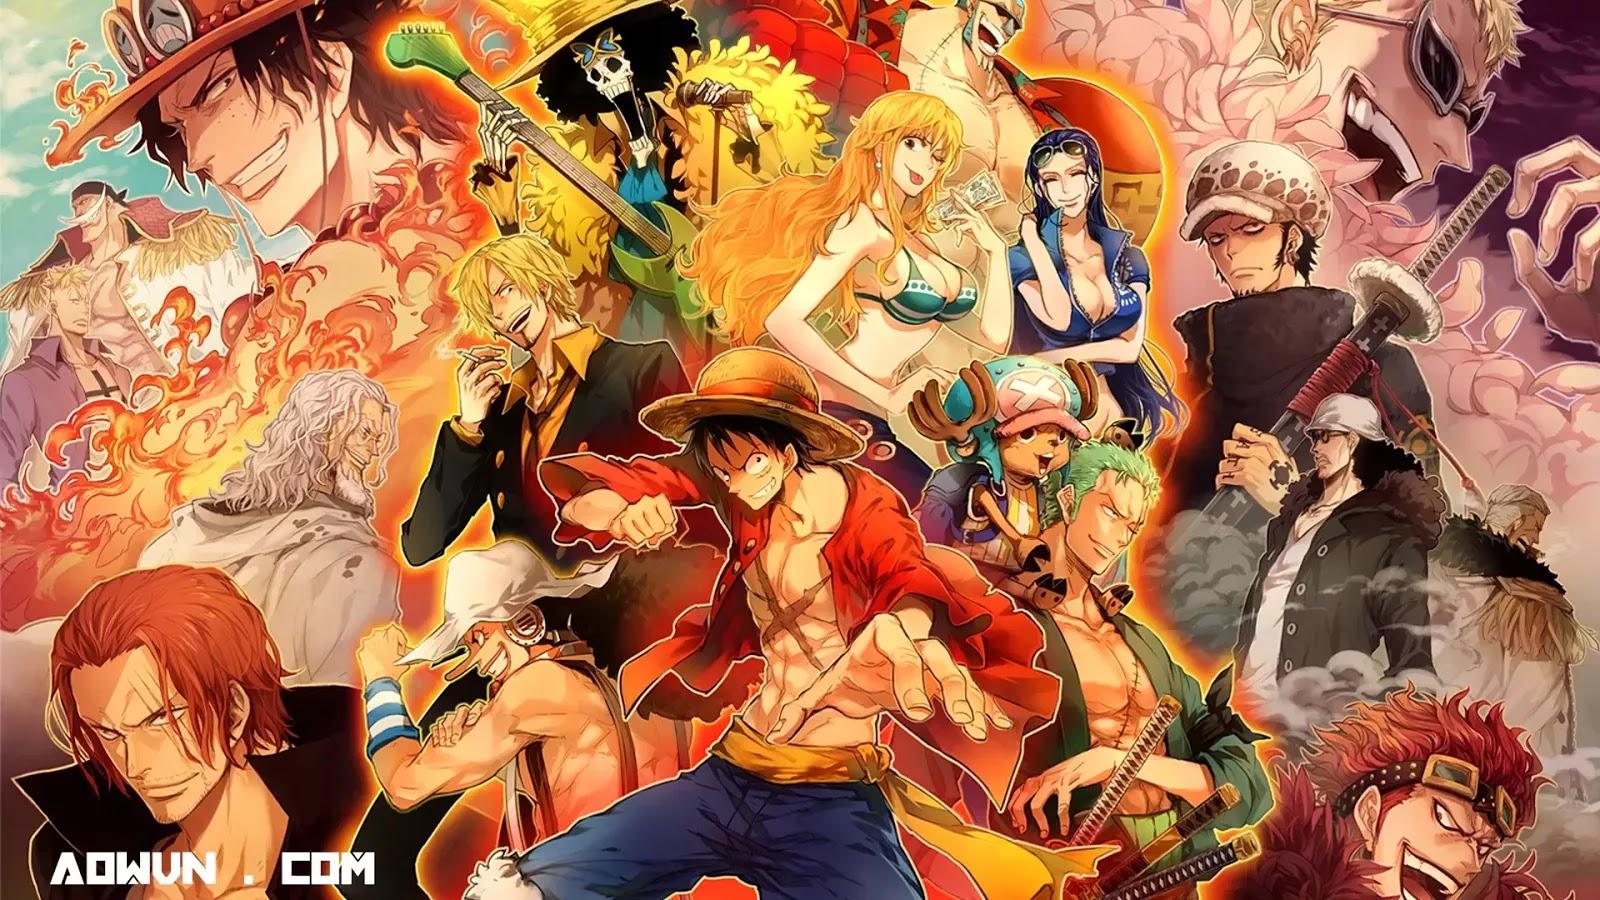 one piece aowvn - [ HOT Anime 3gp Mp4 | Ep 837 ] One Piece | Vietsub - Đảo Hải Tặc